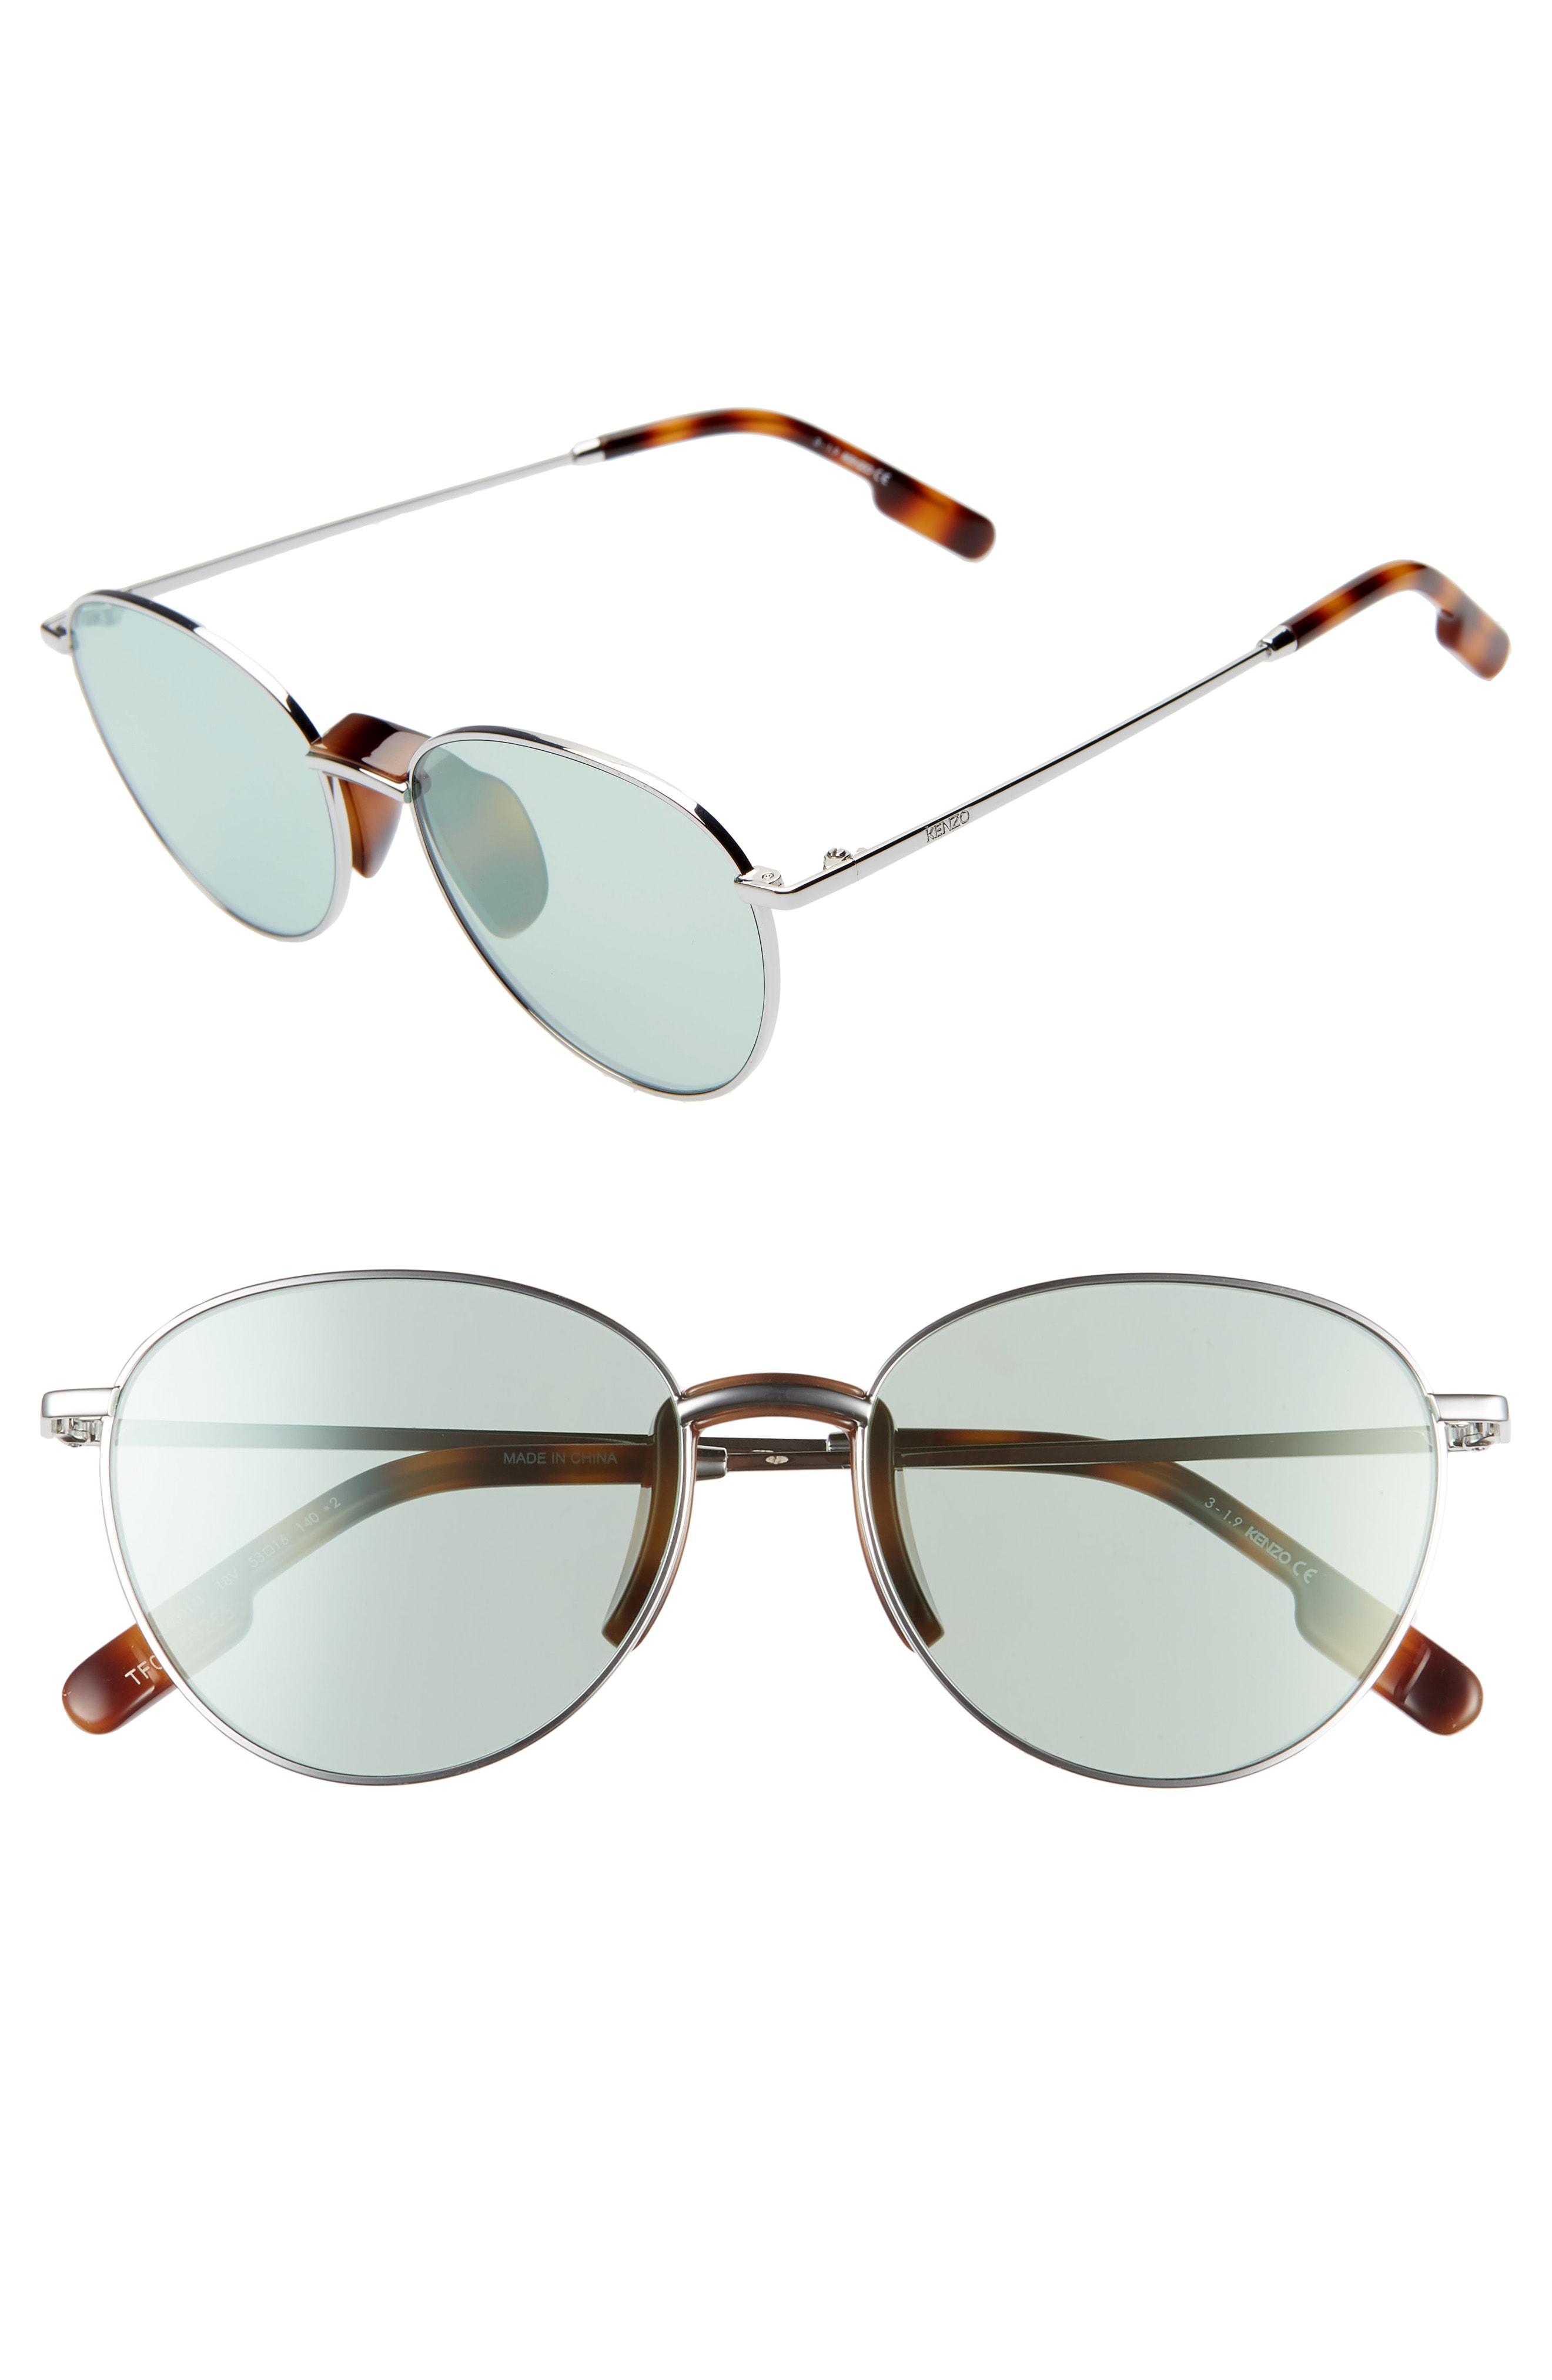 Kenzo 53mm International Fit Round Sunglasses - Shiny Rhodium/ Blue